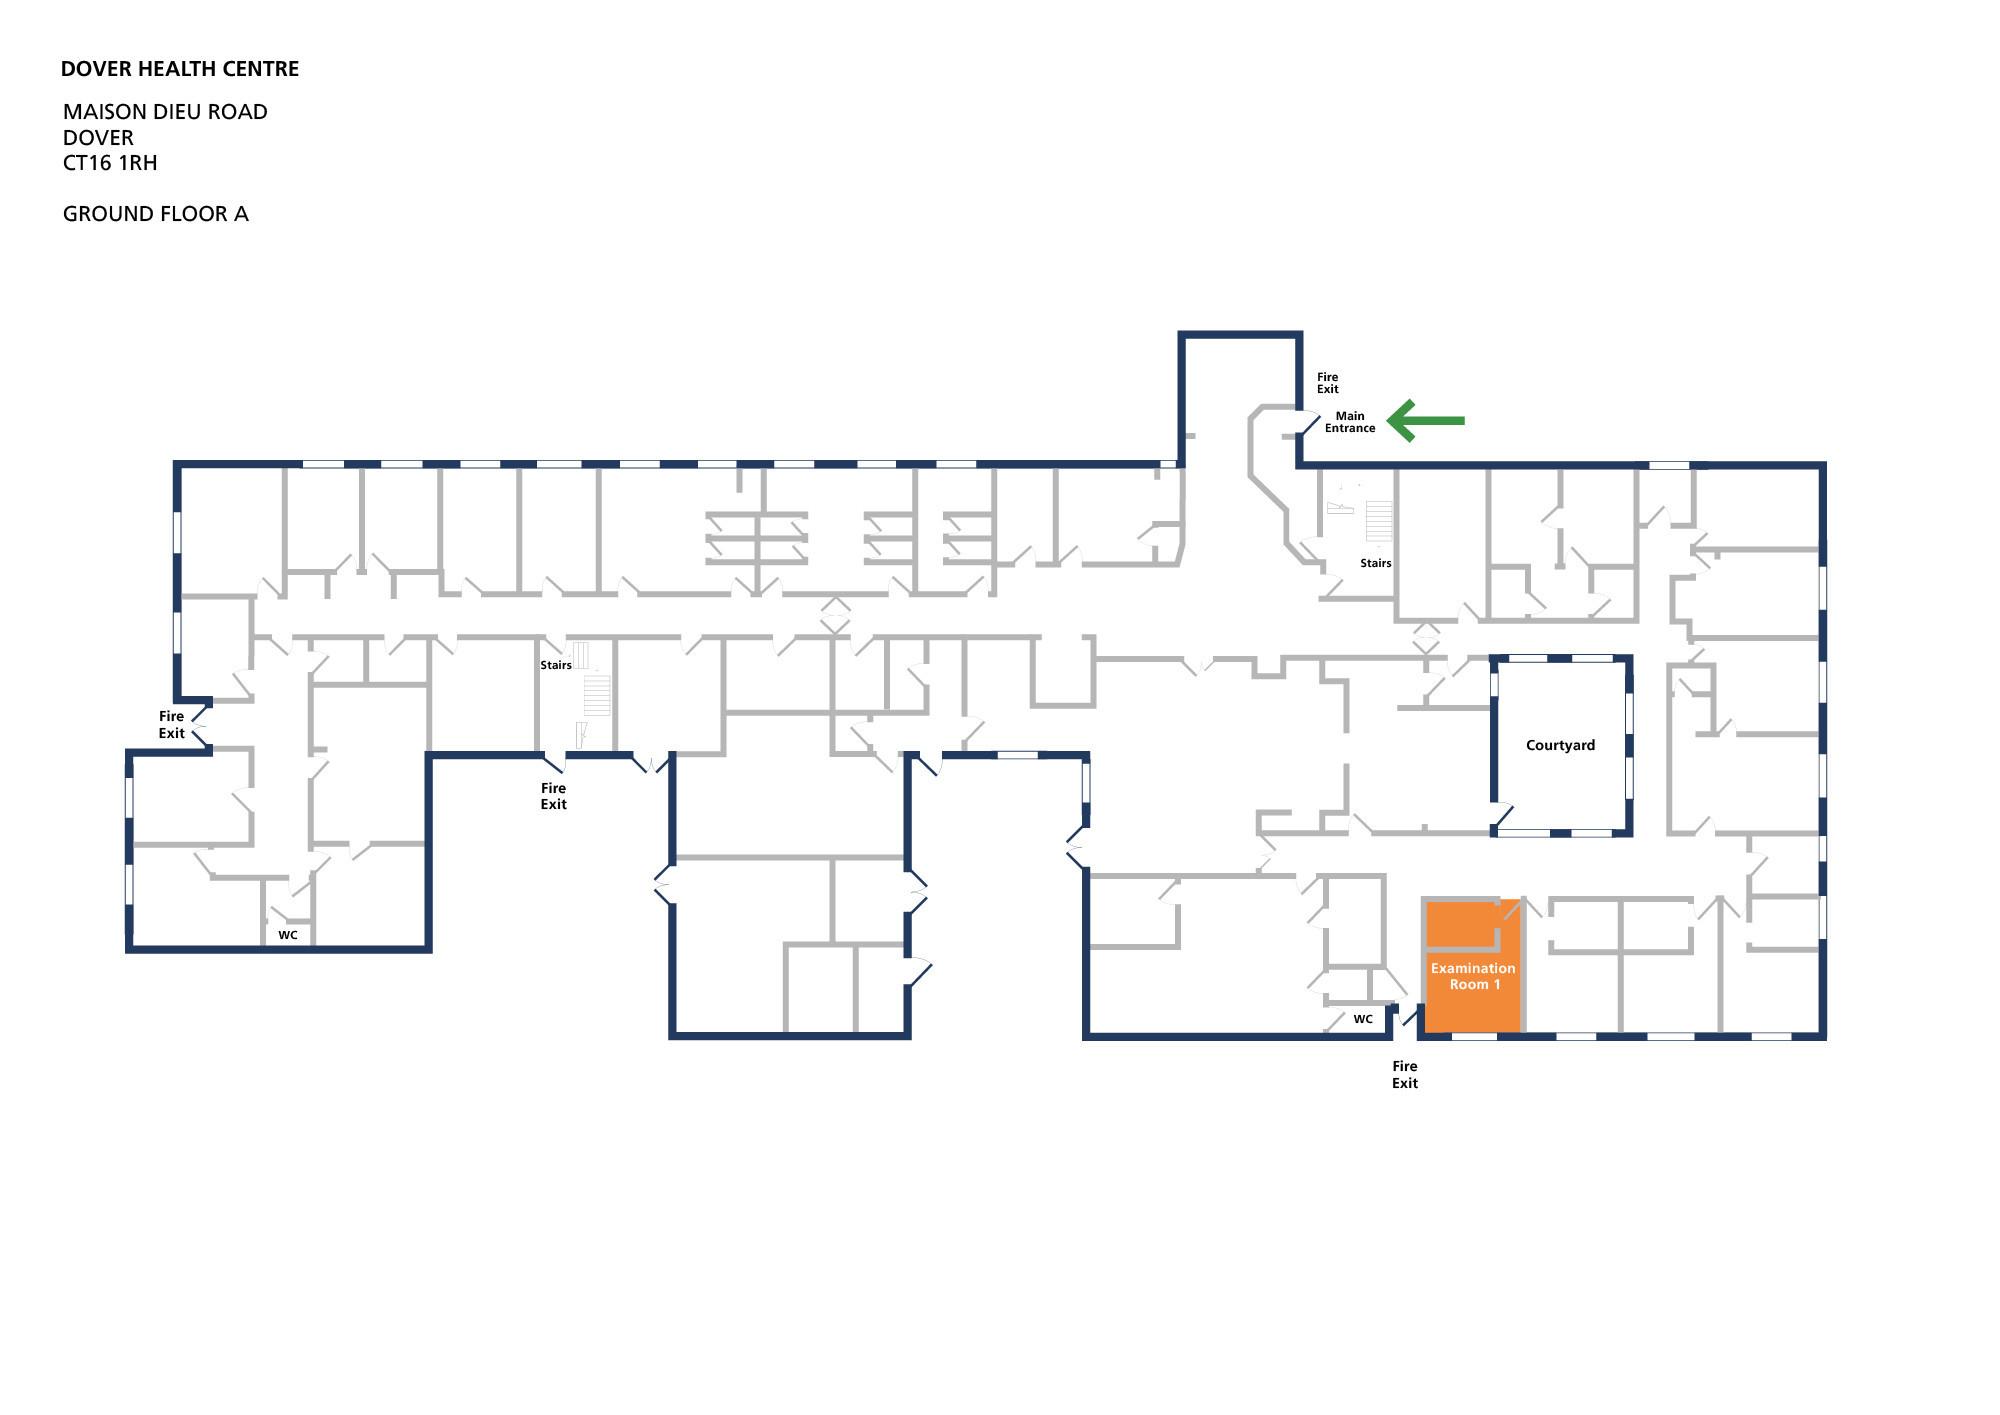 Dover health centre room examination room 1 v1